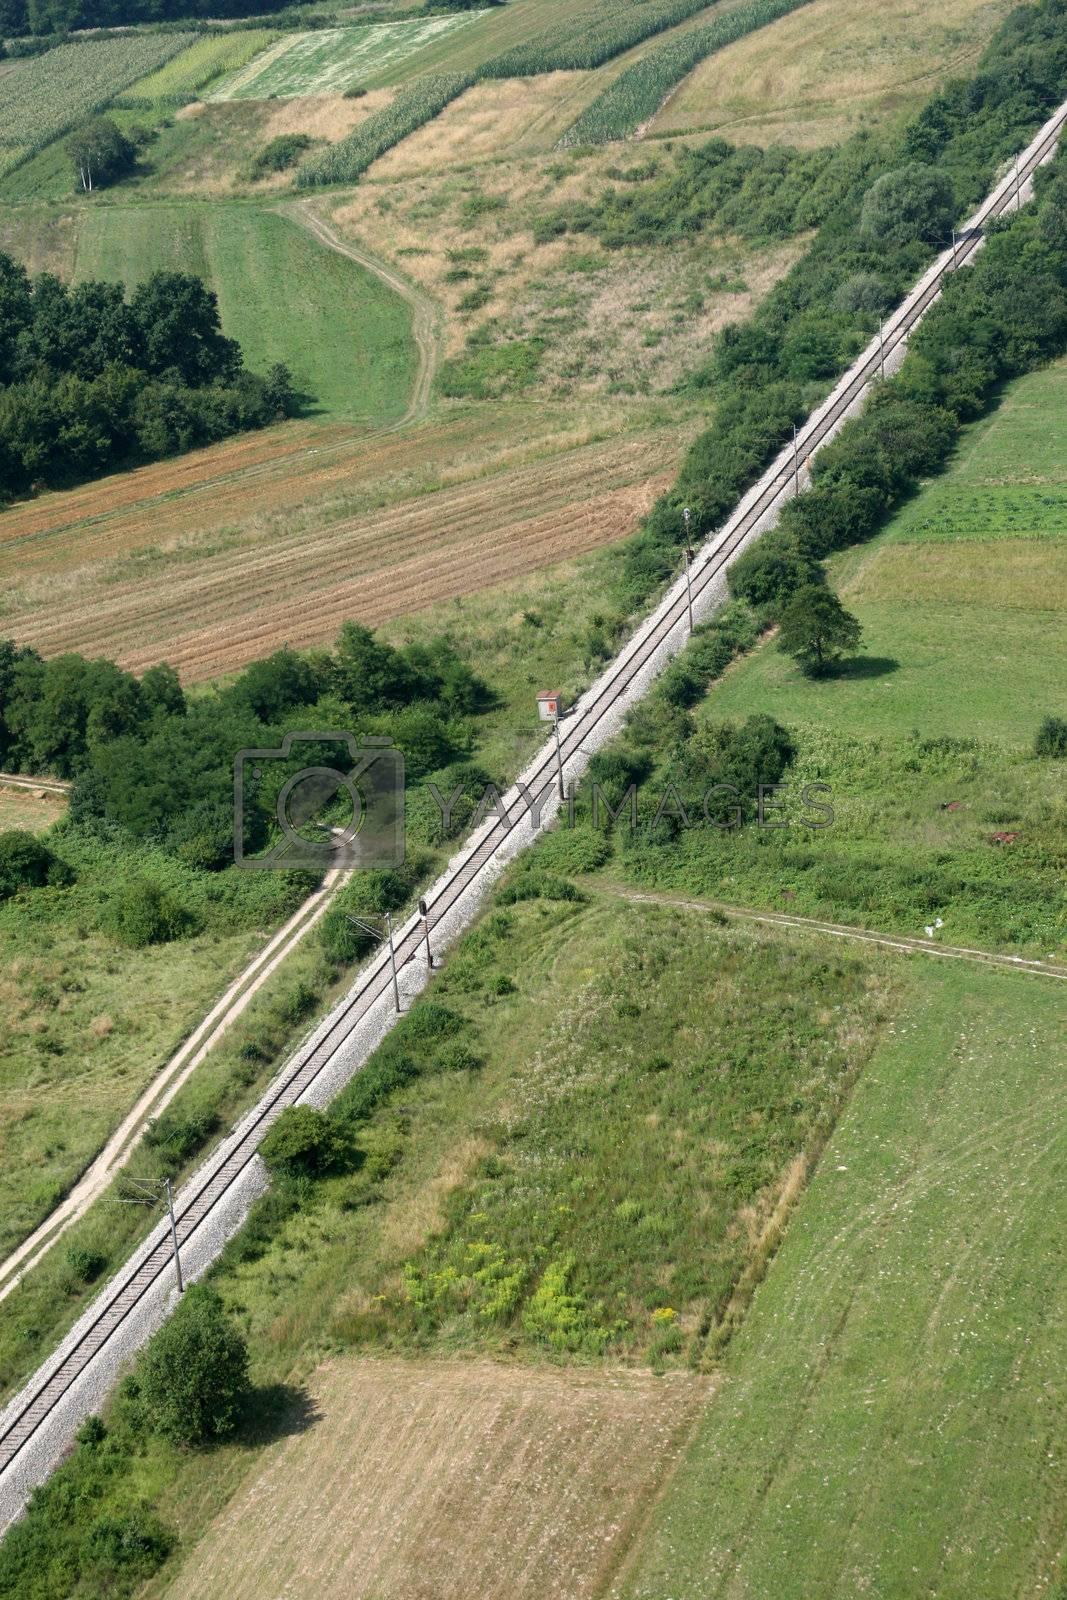 Railroad and green field